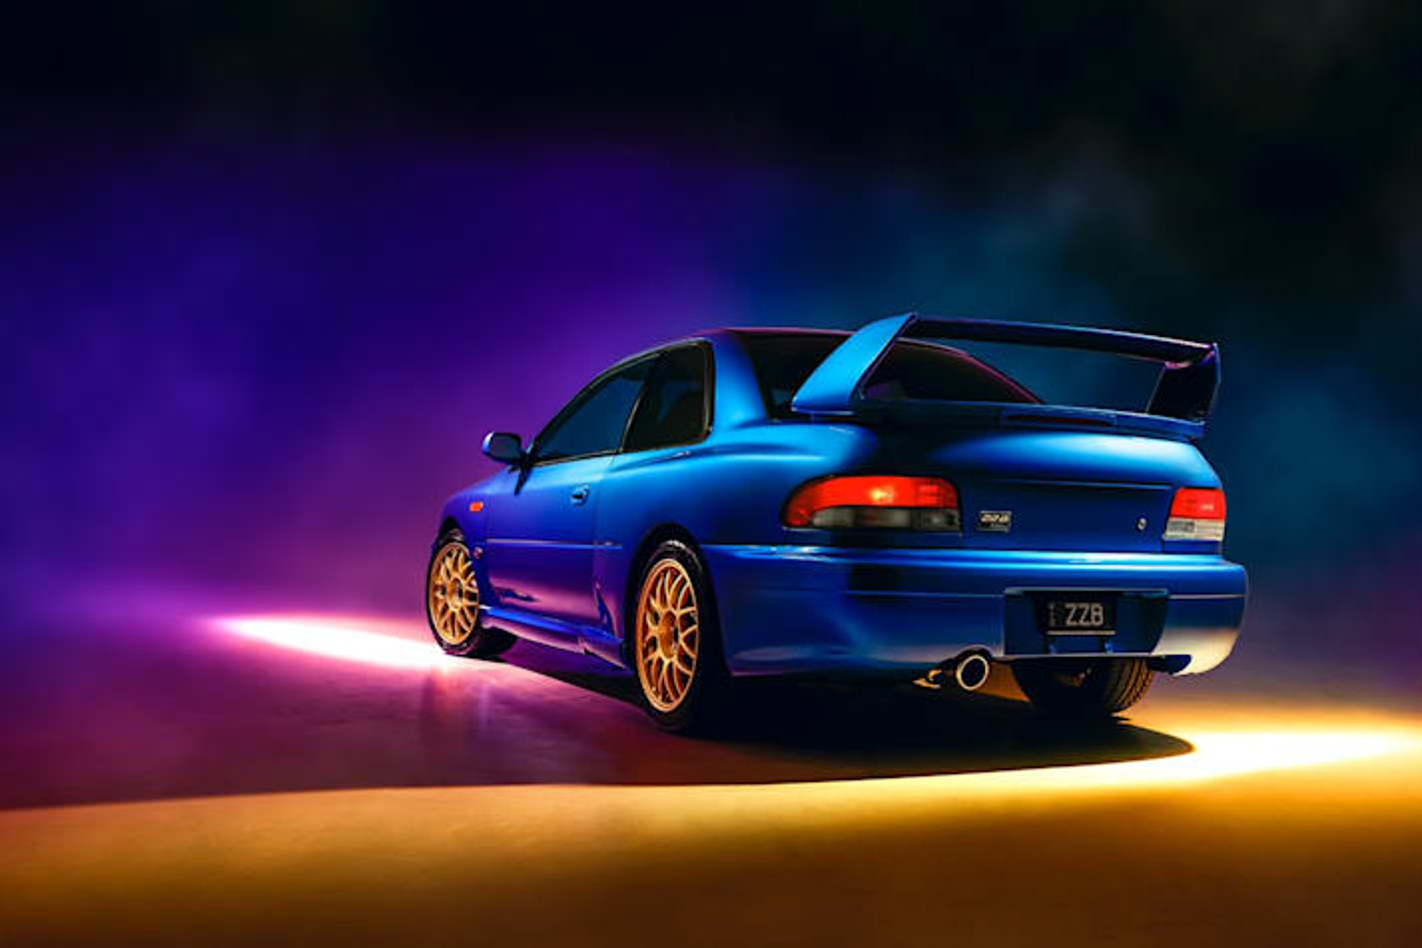 1998 Subaru Impreza WRX 22B-STi Version Modern Classic